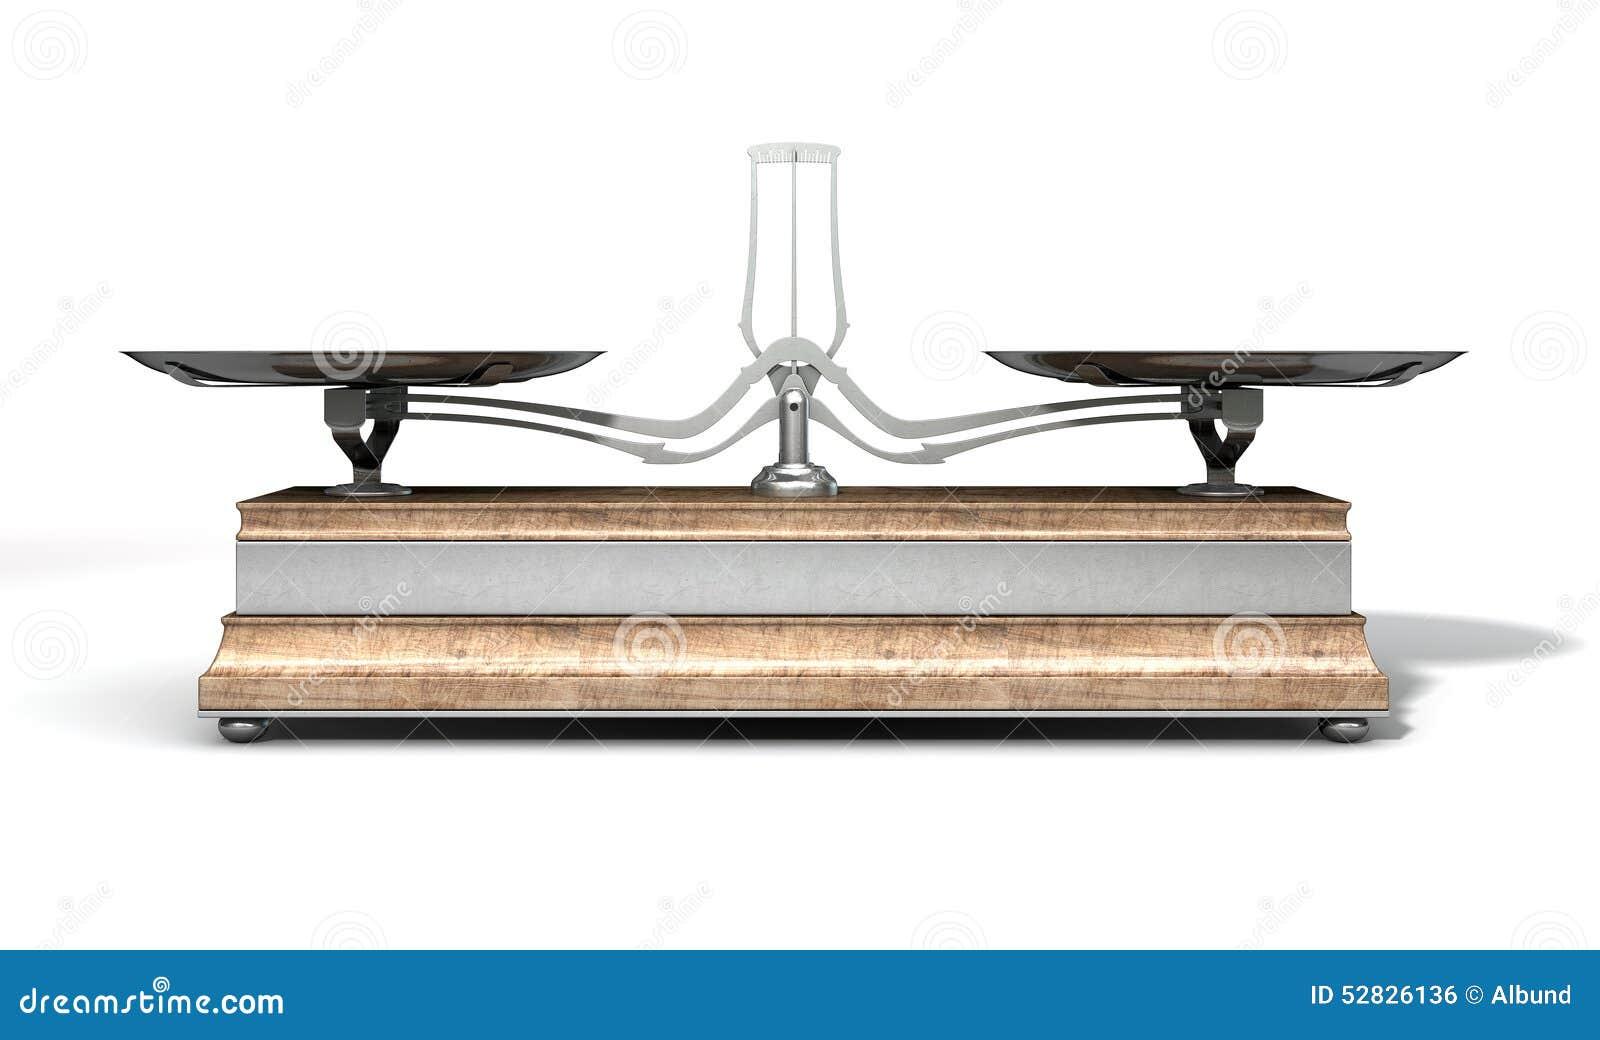 pan balance scale - photo #20